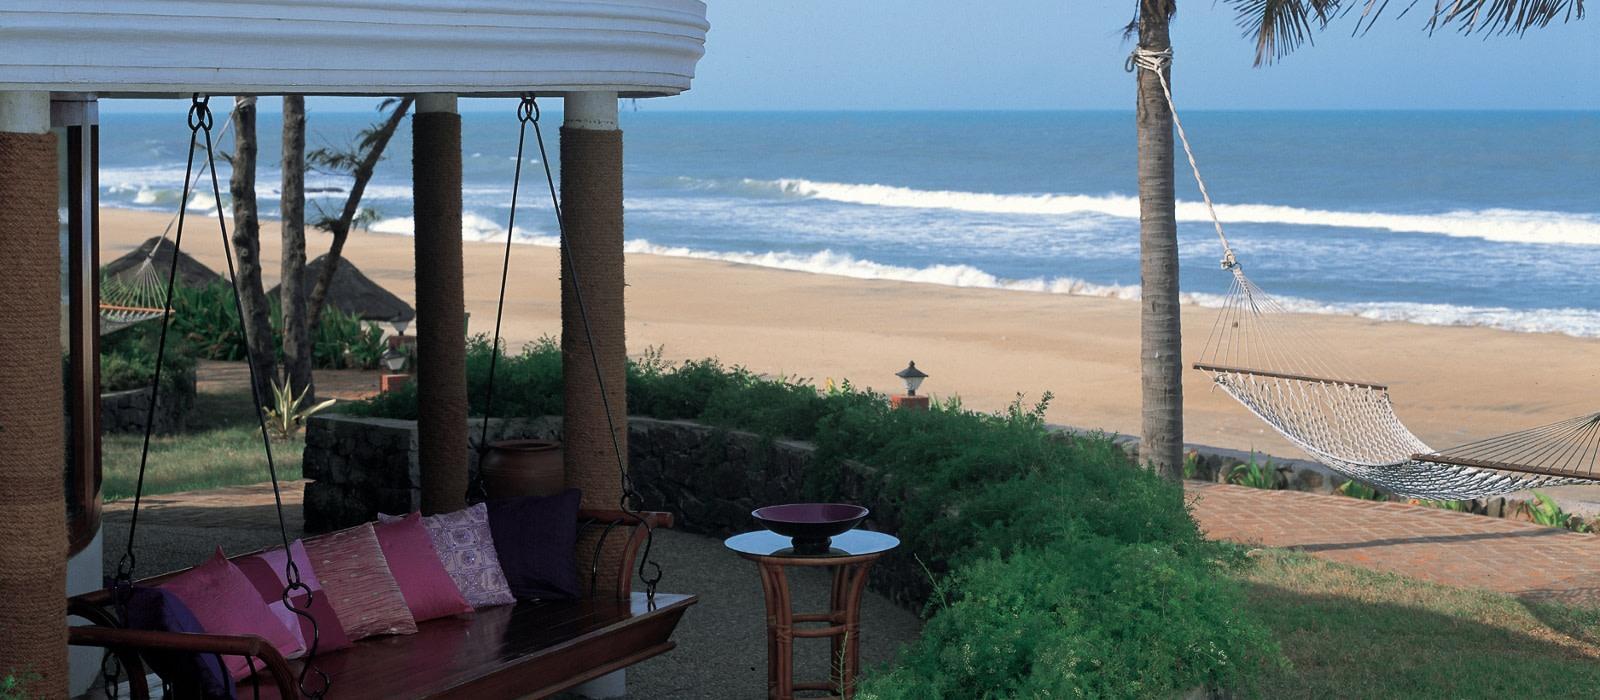 Hotel Vivanta by Taj – Fishermans Cove, Chennai Südindien